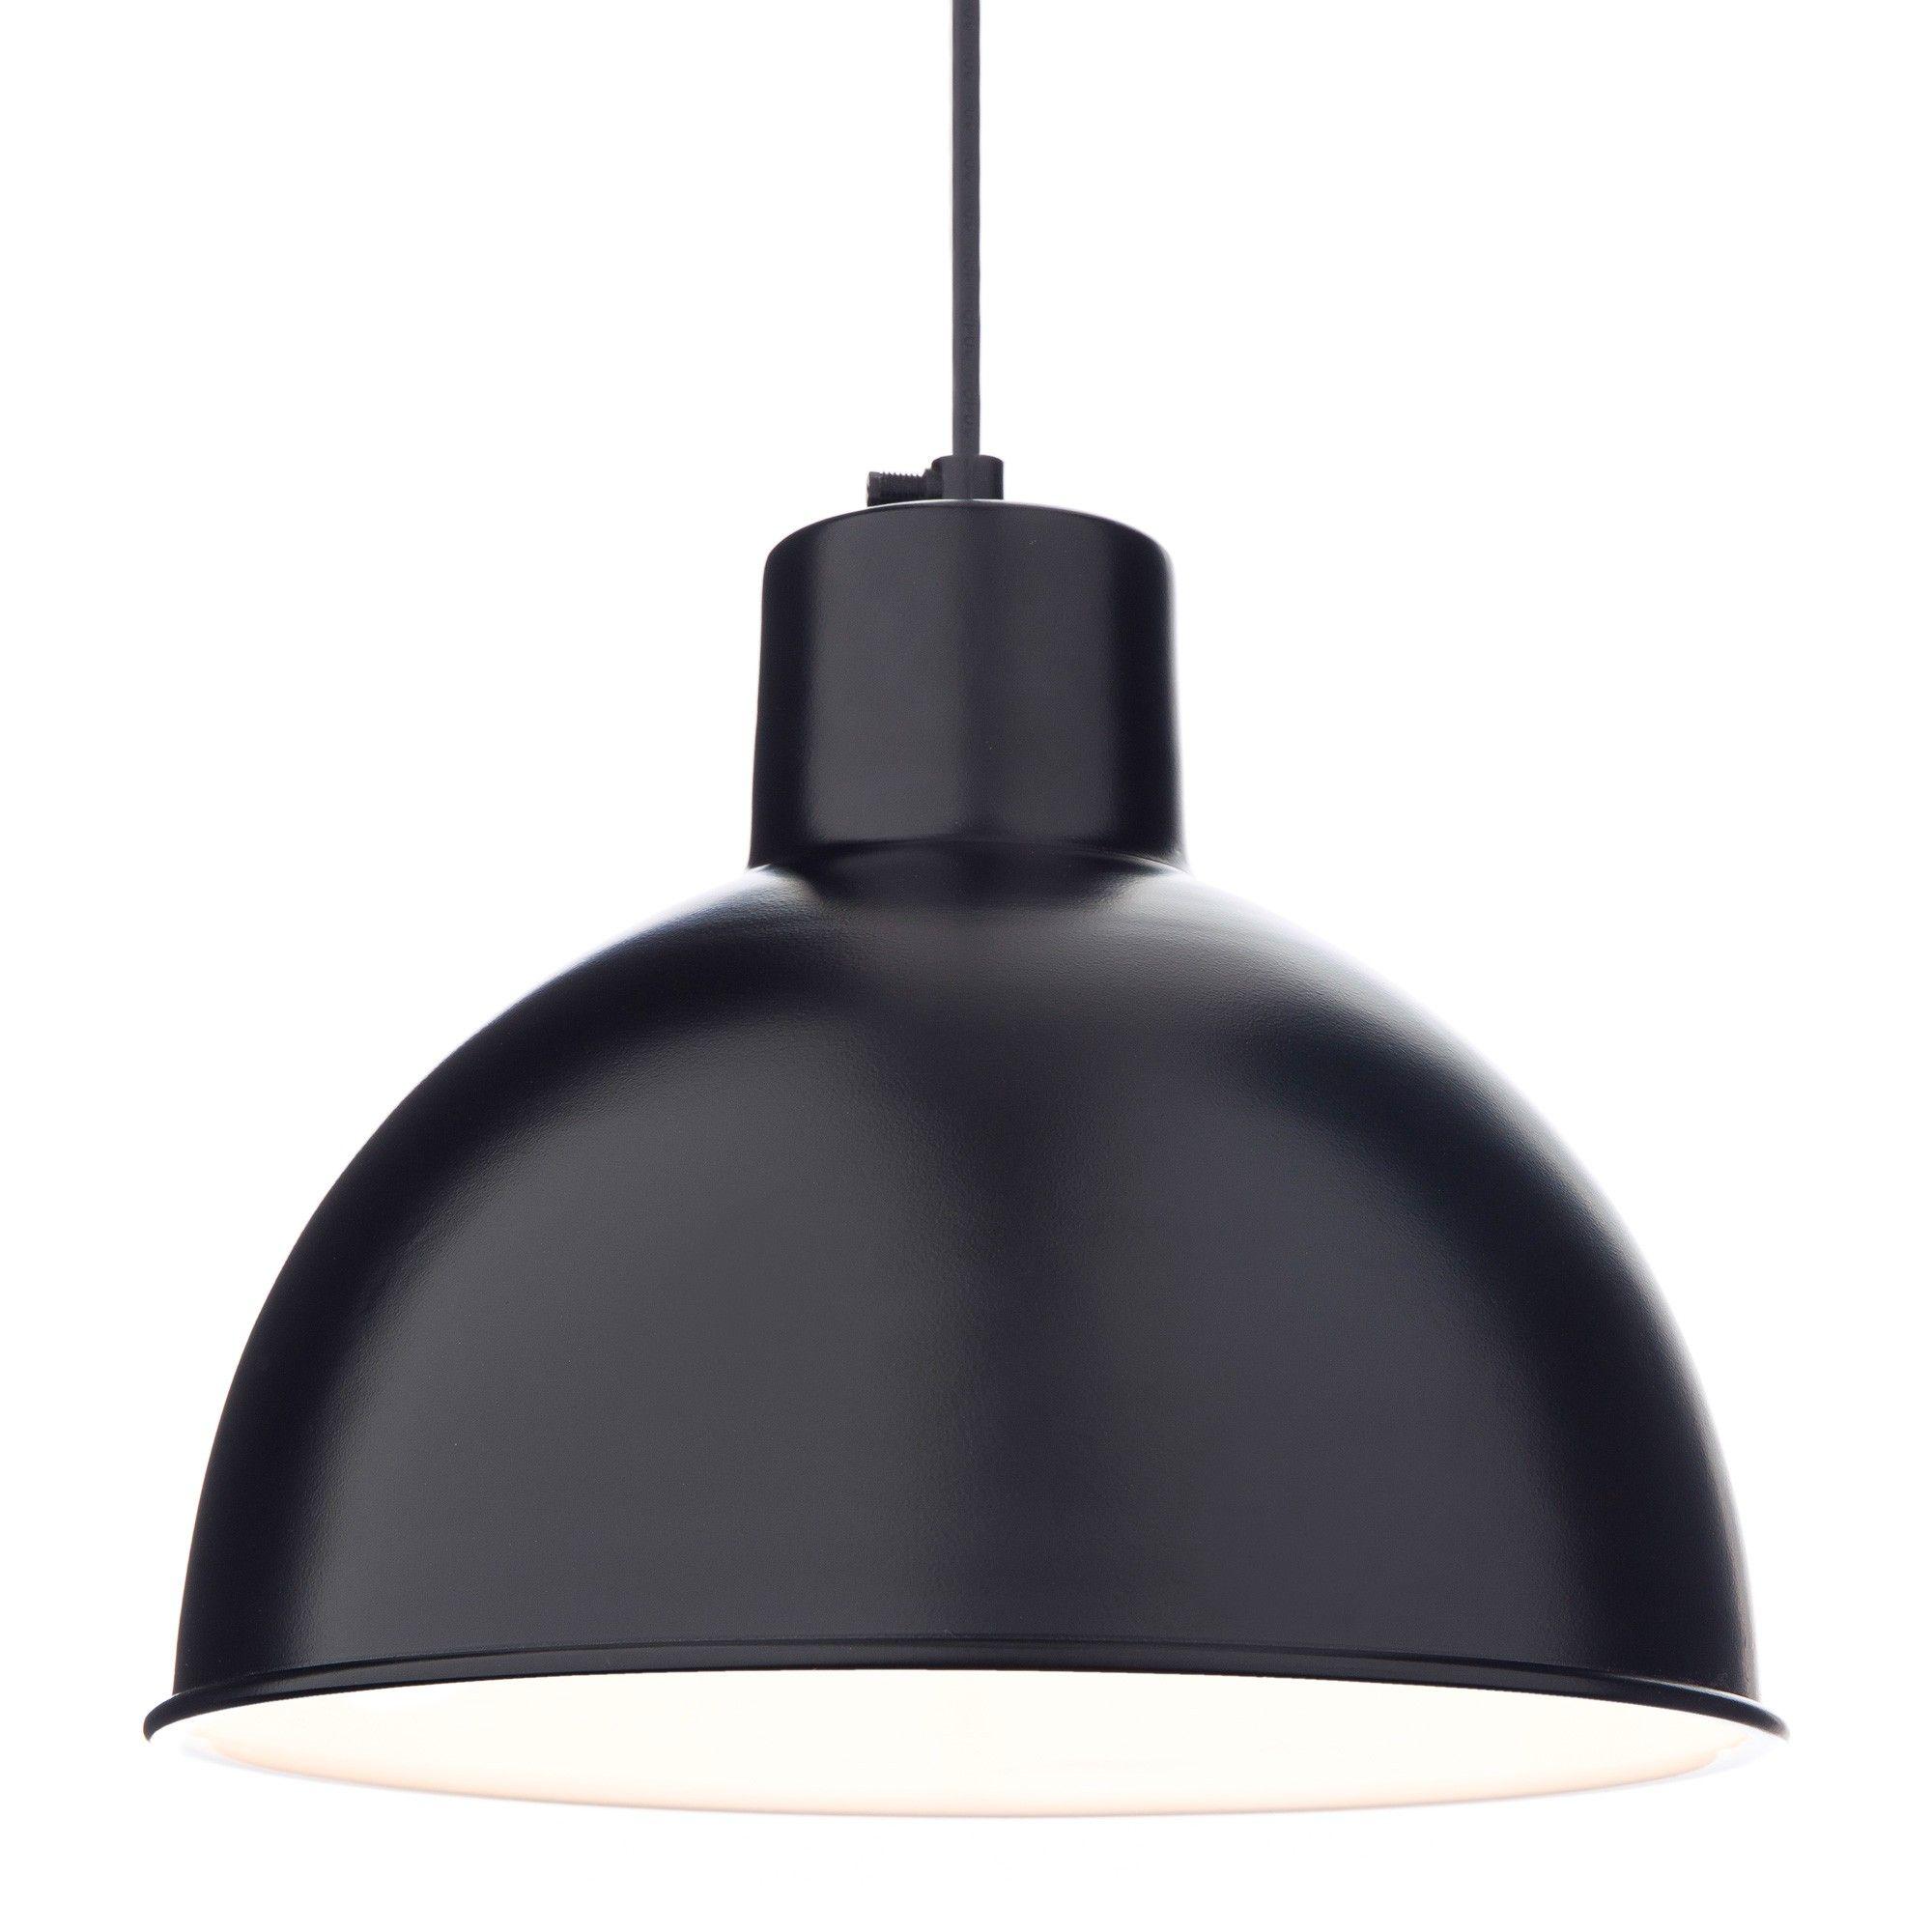 h ngelampe tarnby lampen pendant lamp industrial light fixtures und light fixtures. Black Bedroom Furniture Sets. Home Design Ideas